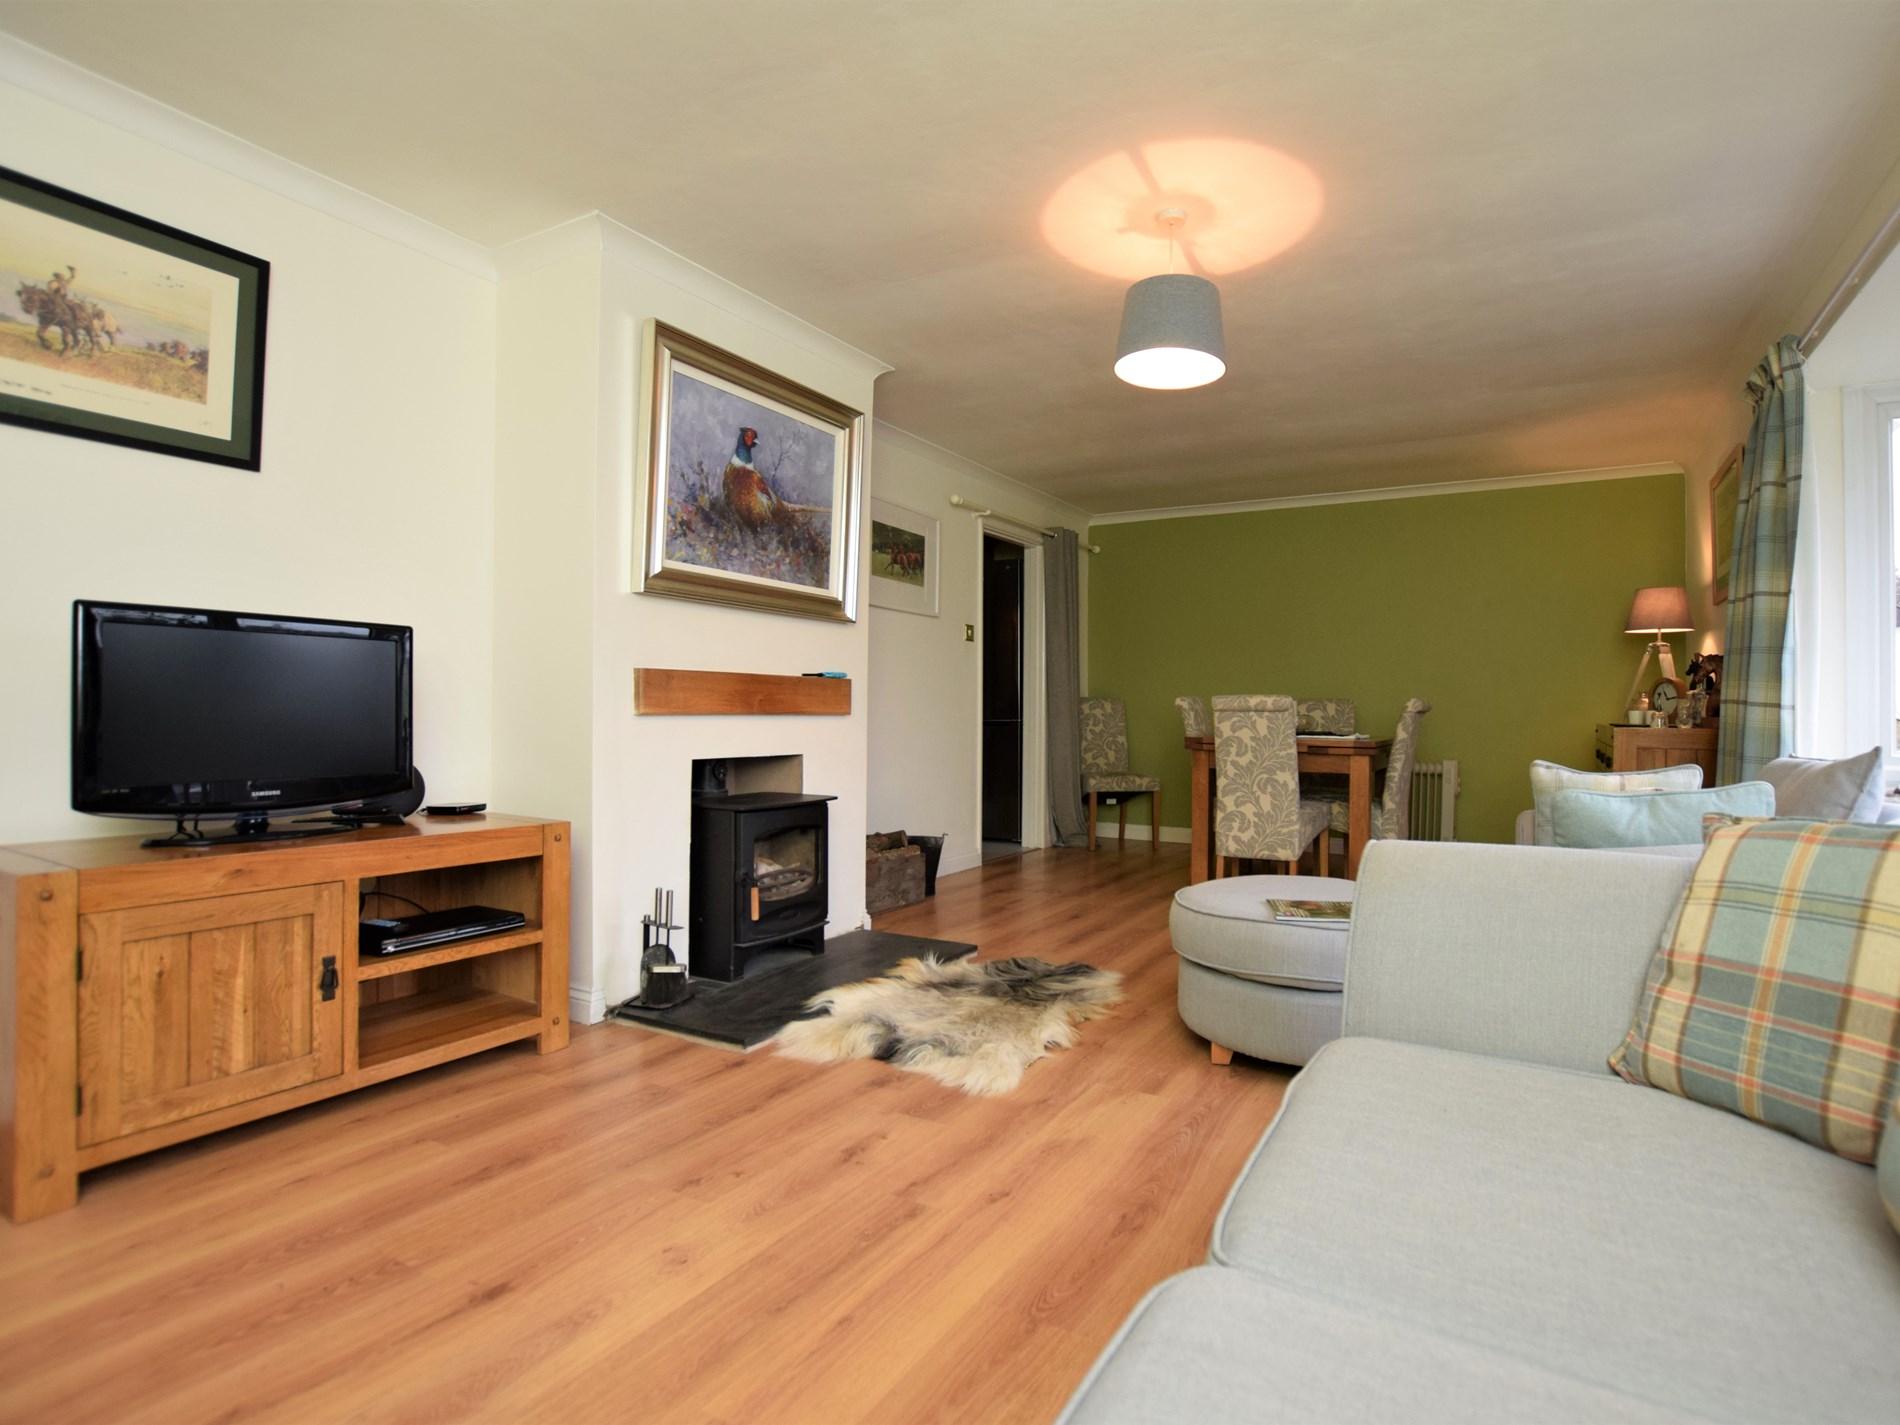 2 Bedroom Cottage in Dulverton, Dorset and Somerset